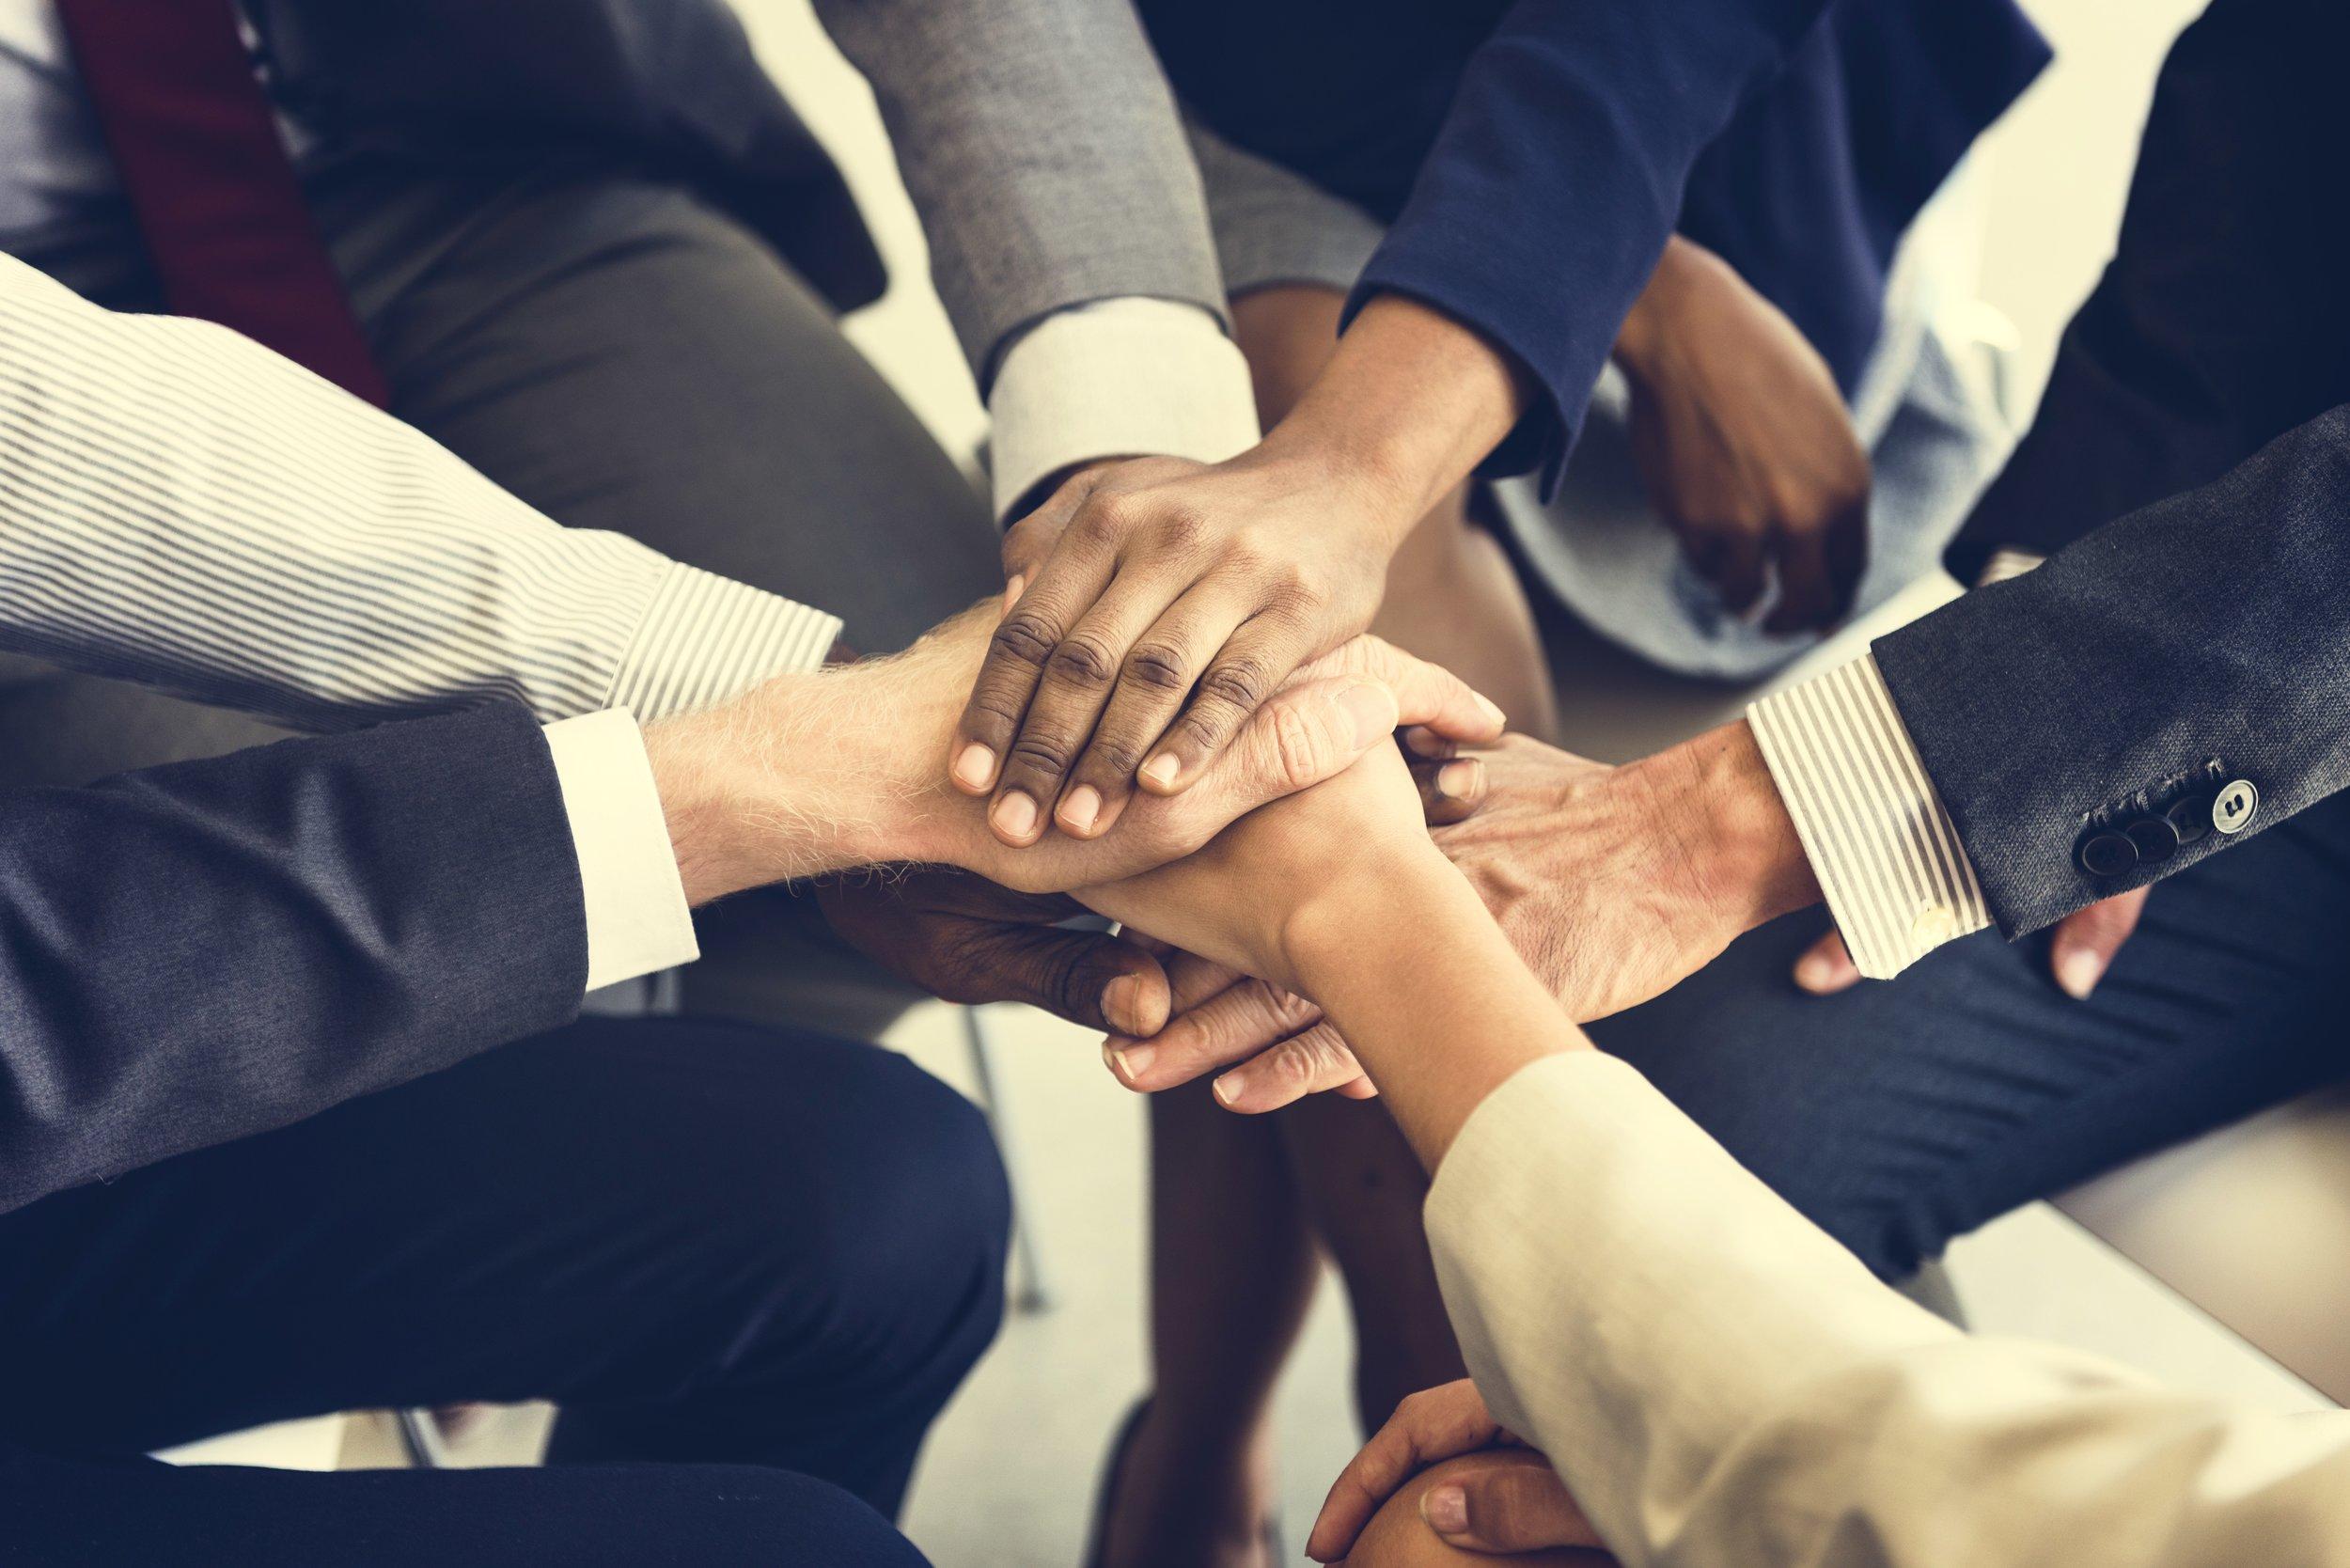 business-team-stack-hands-support-concept-PZMFPTE.jpg